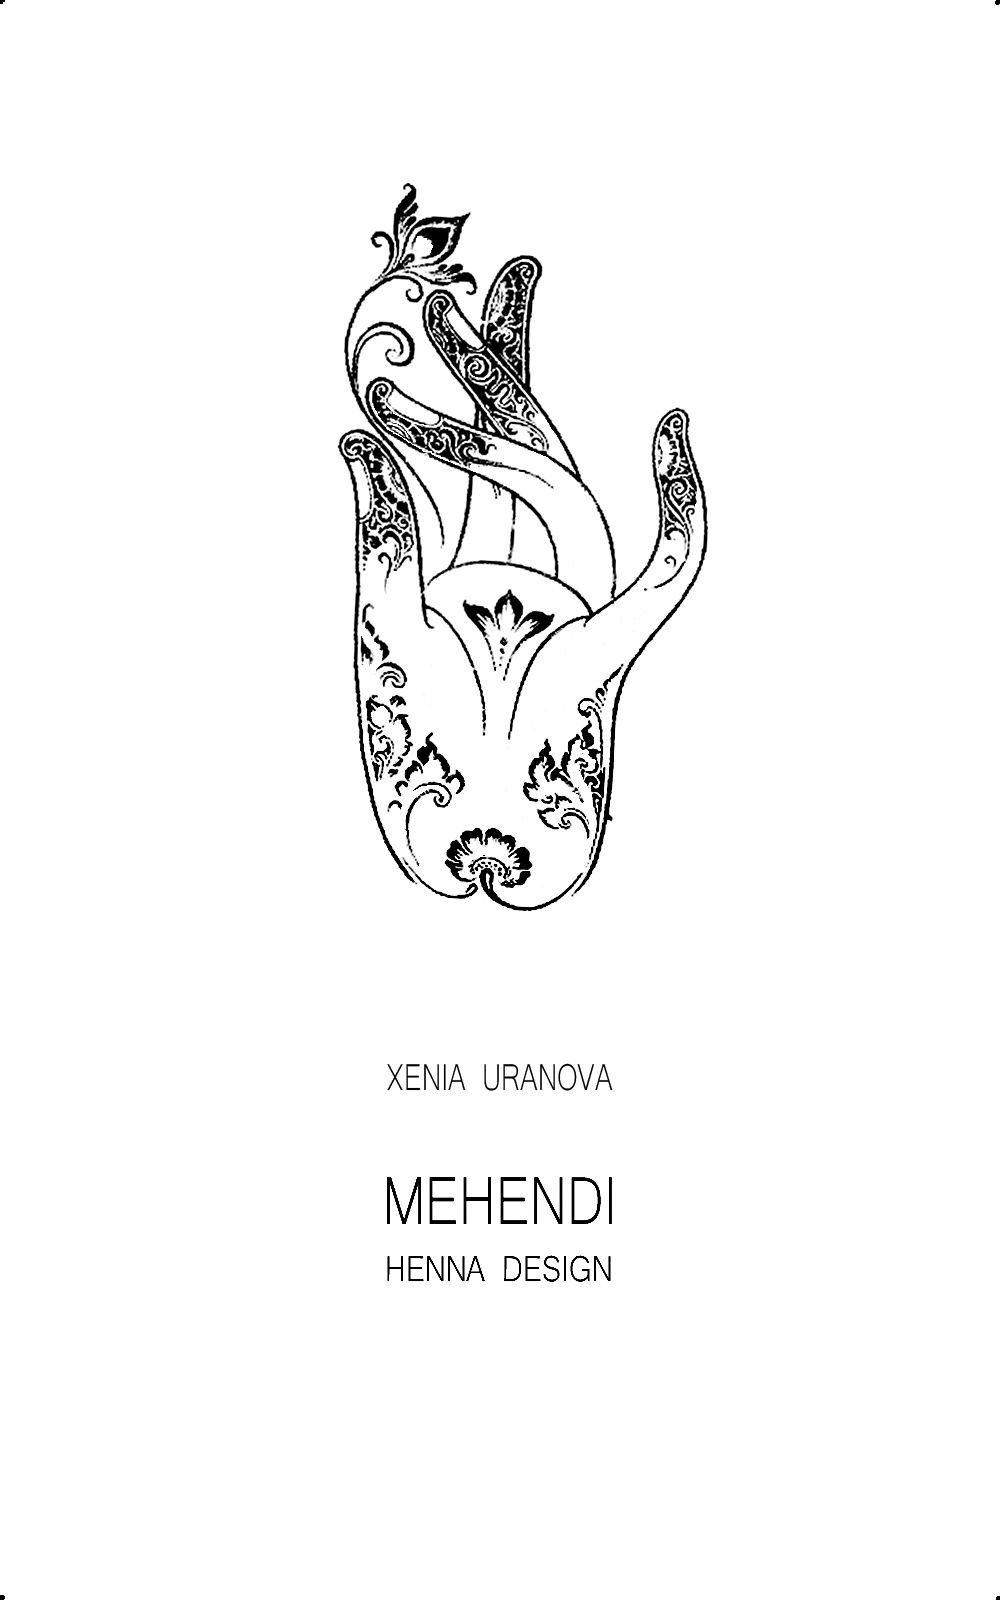 xenia.uranova.mehendi.henna